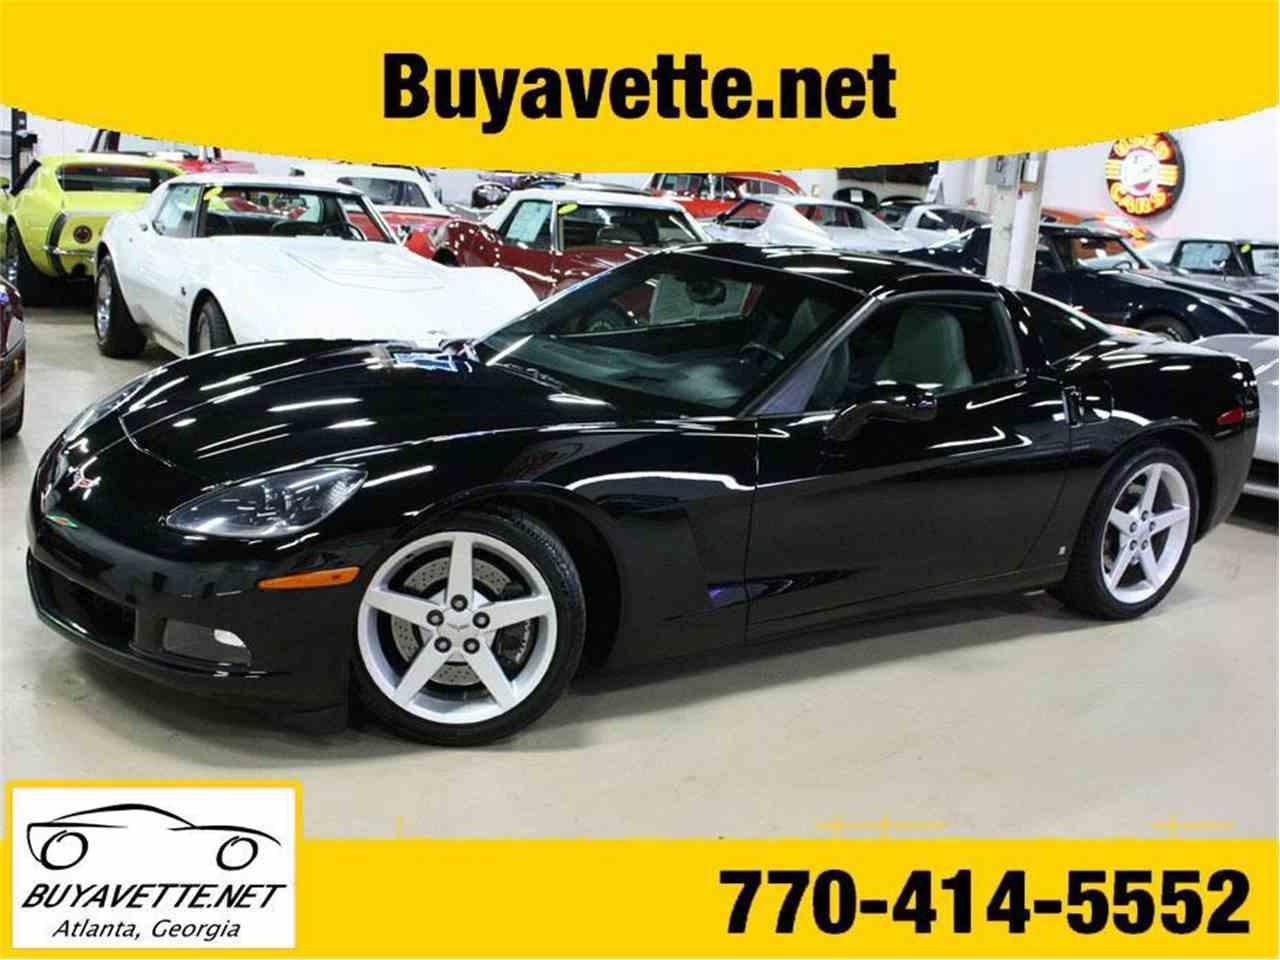 2006 Chevrolet Corvette for Sale - CC-1033352